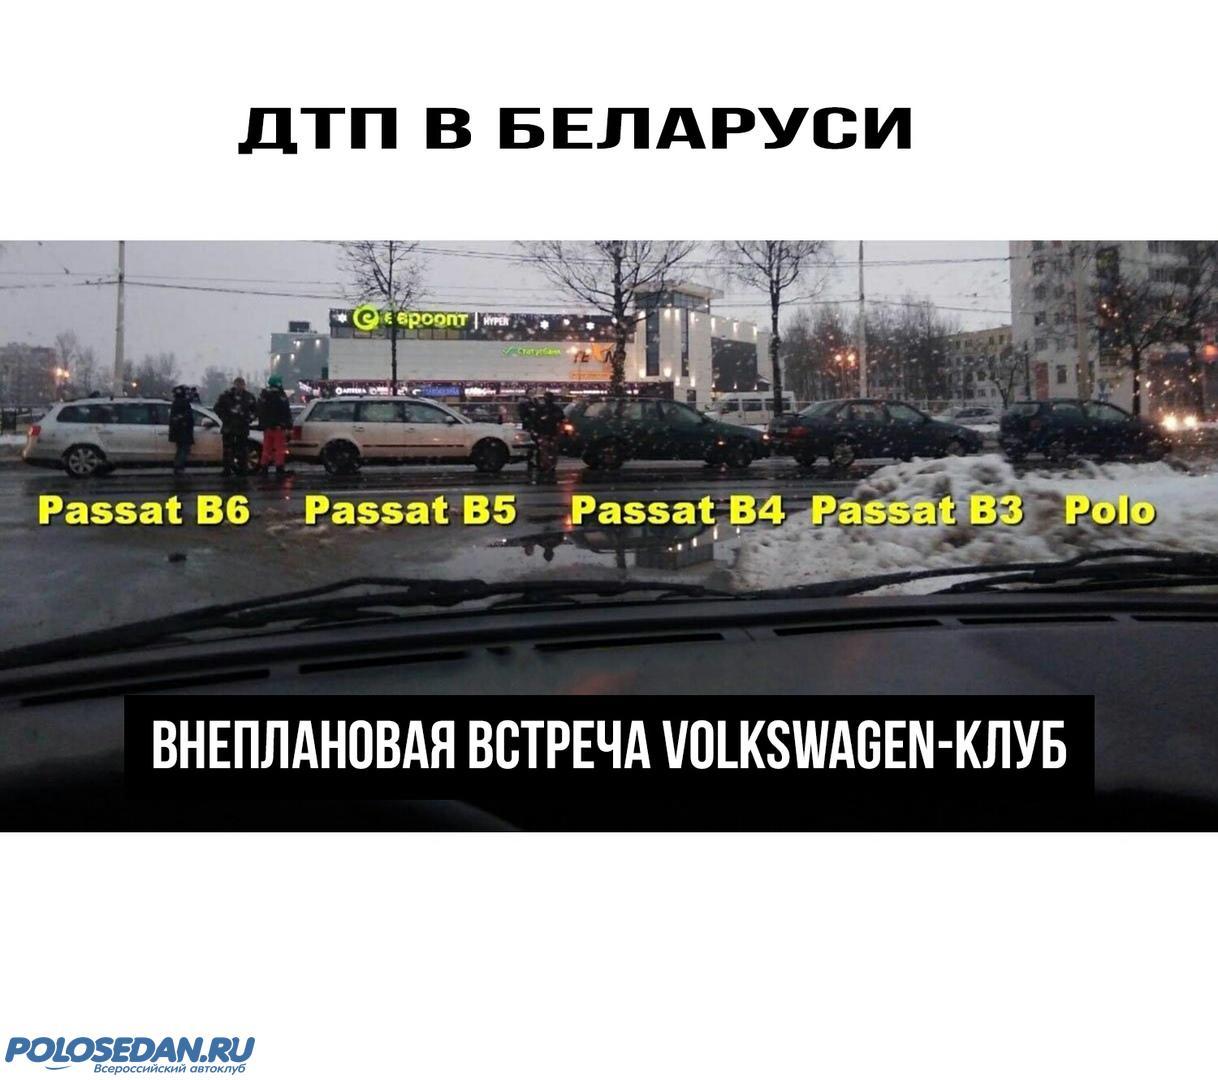 Клубный календарь 2015 Polosedan.ru